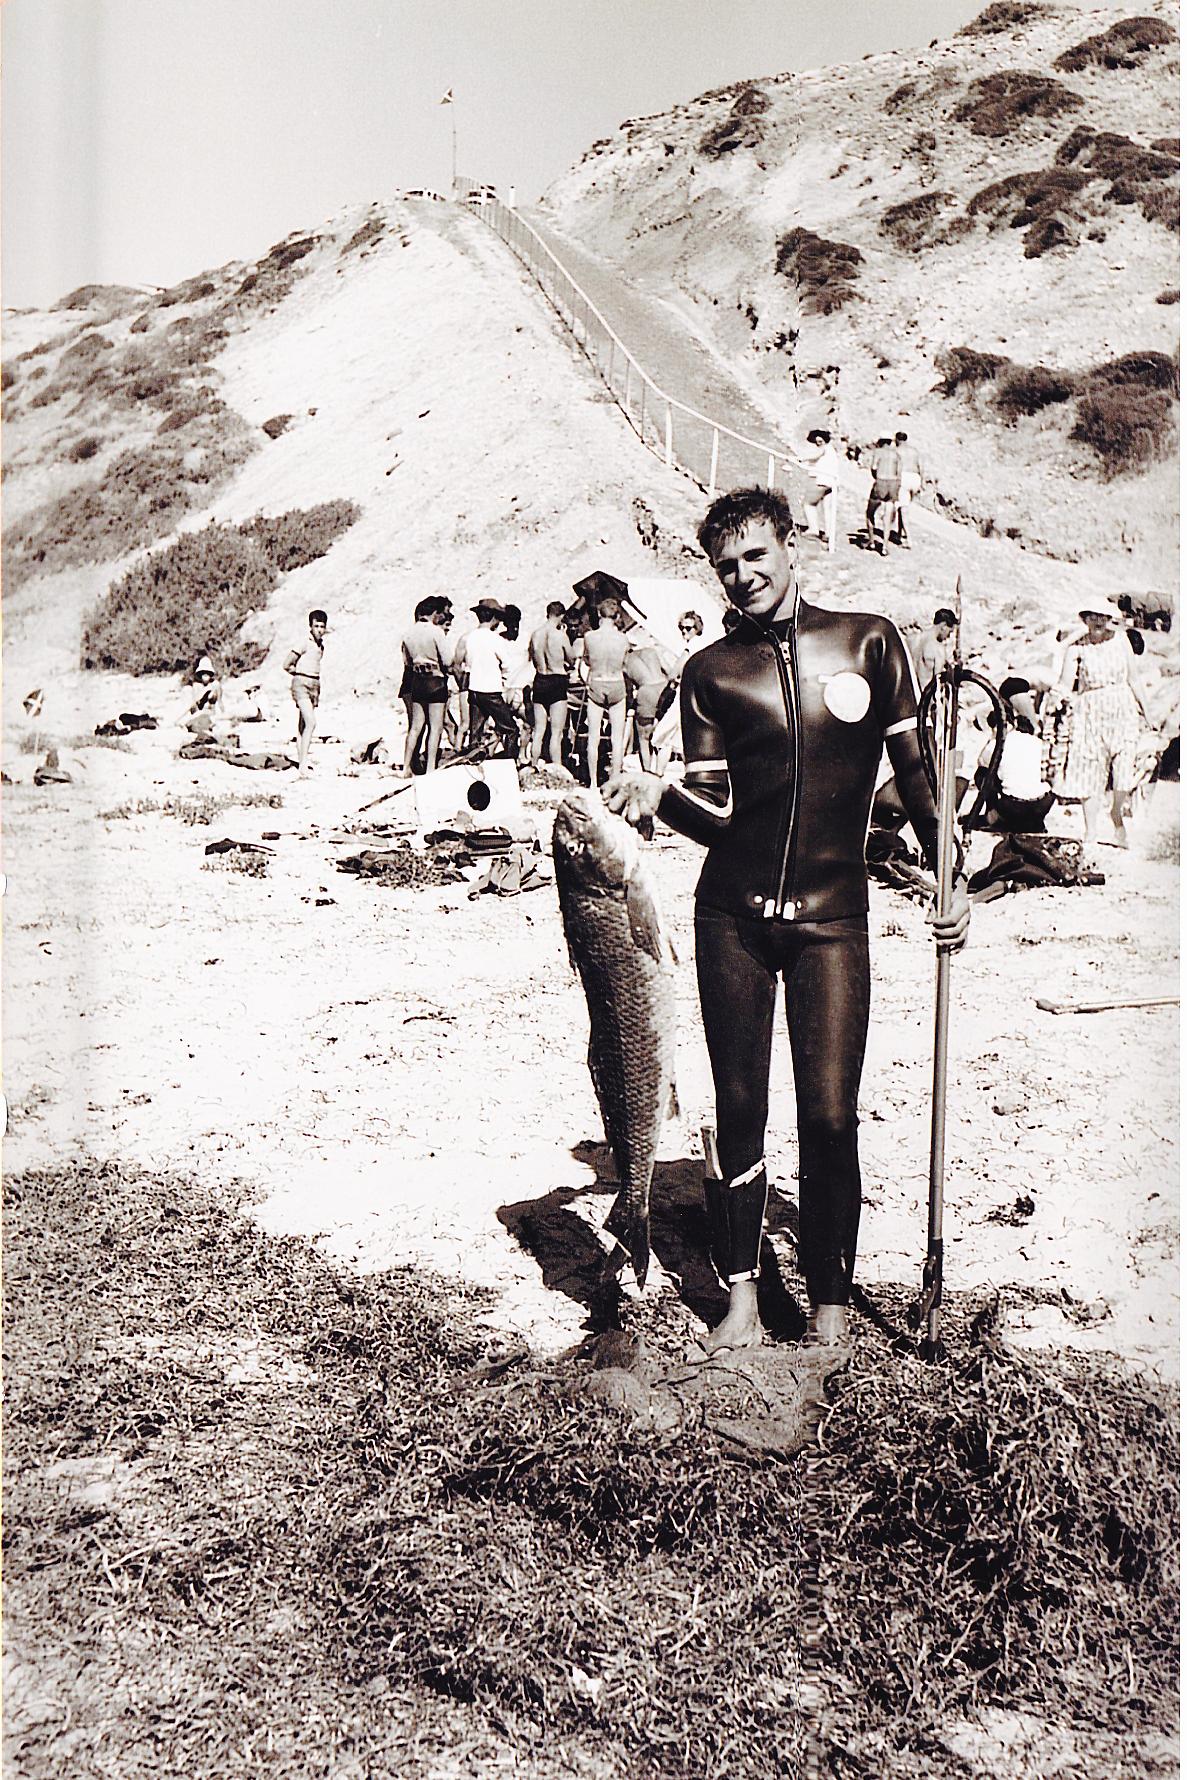 Rodney Fox on Aldinga Beach, one year before his shark attack